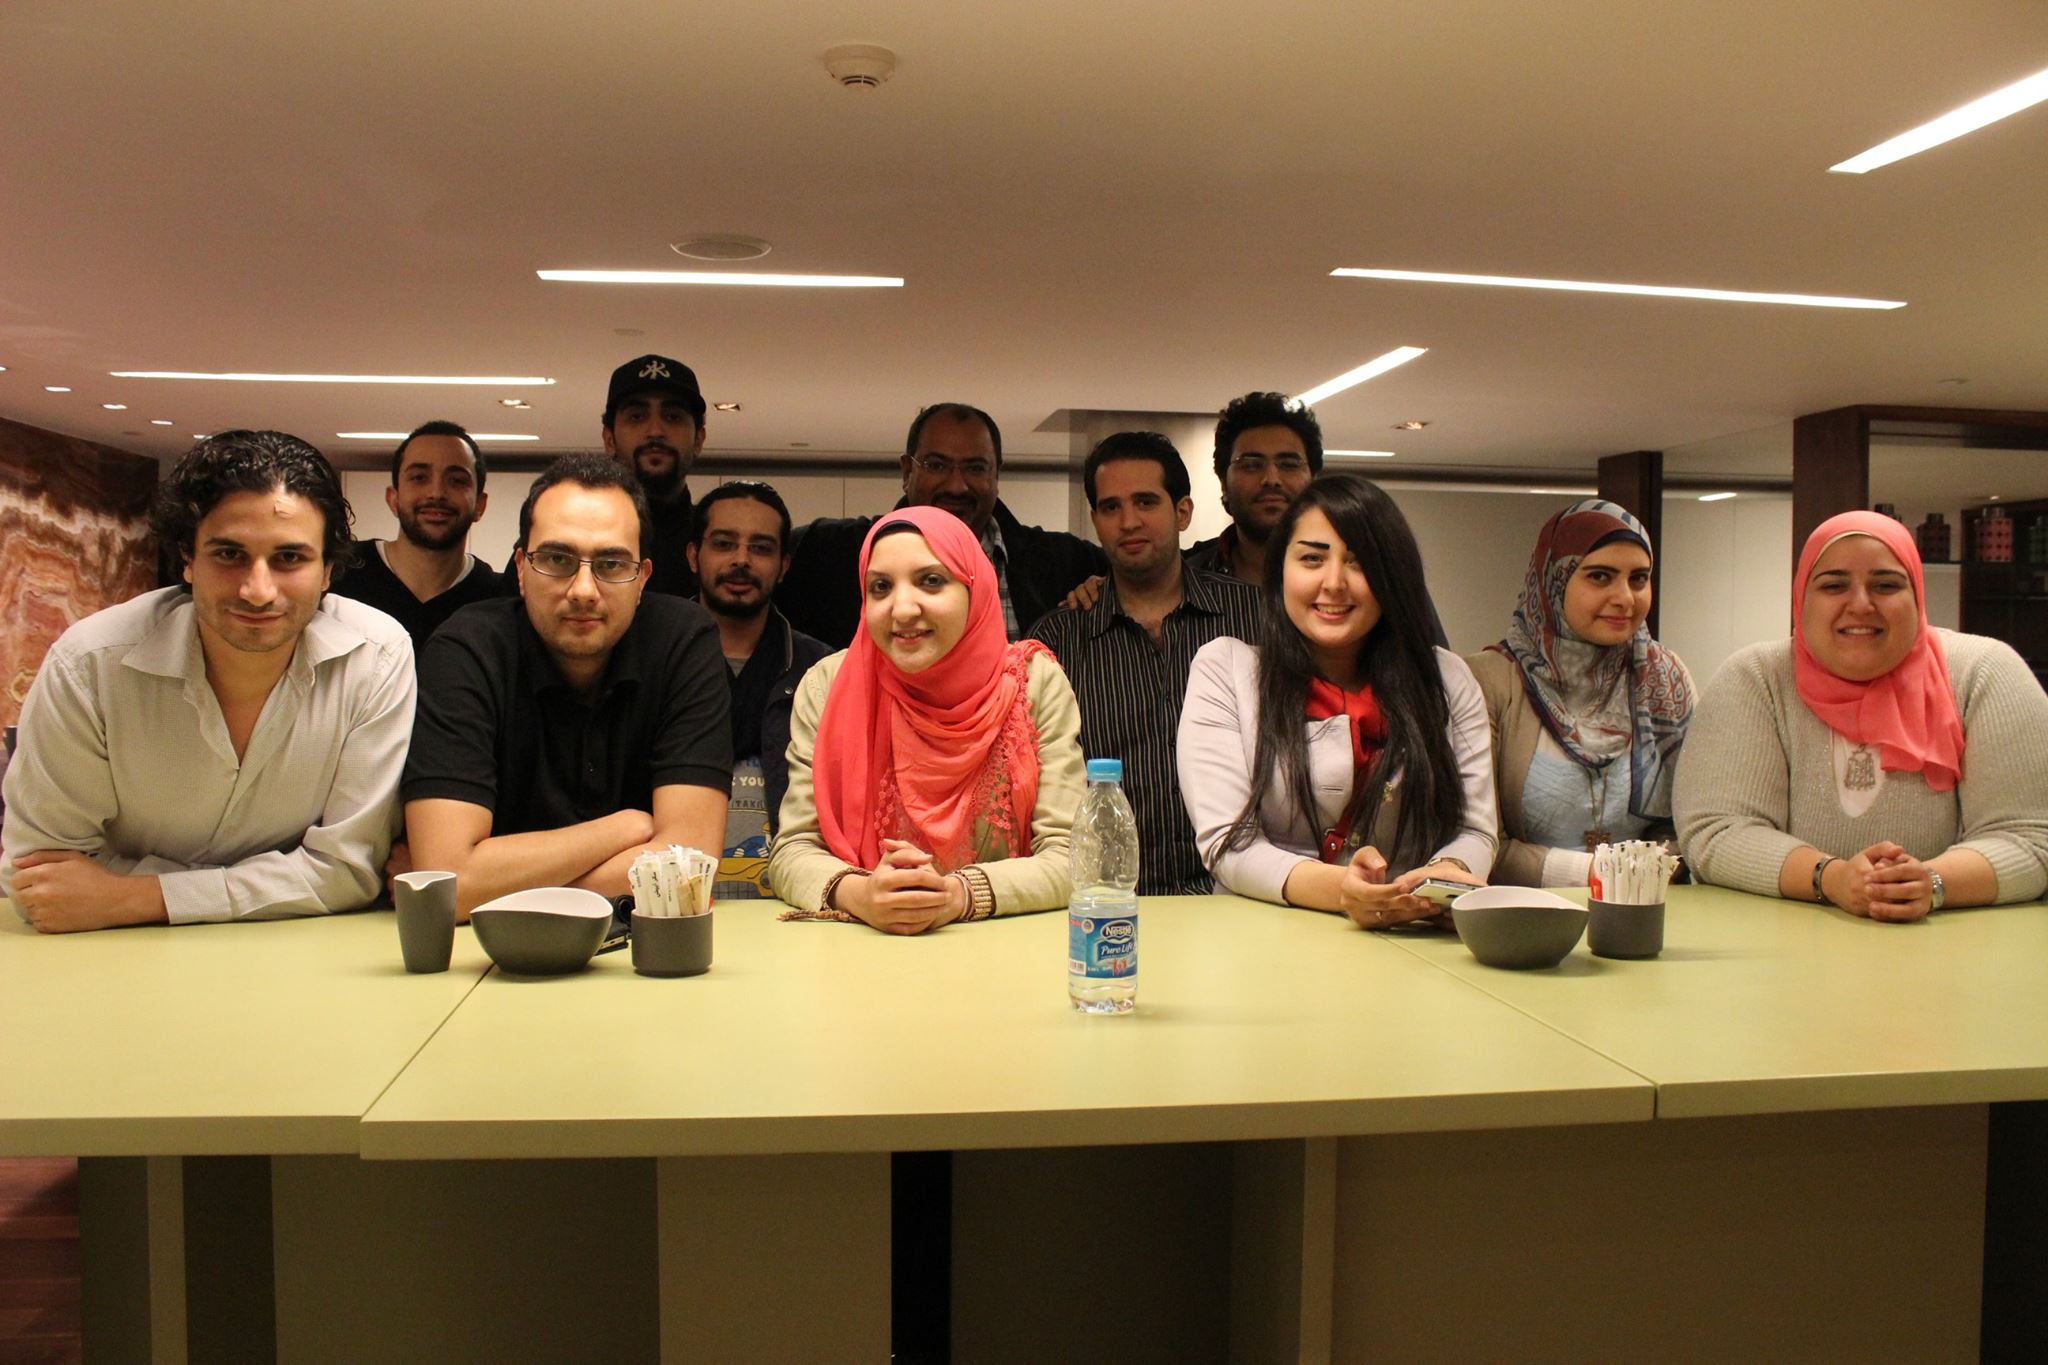 Egypt_Cloud_FIlm_Workshop3.jpg